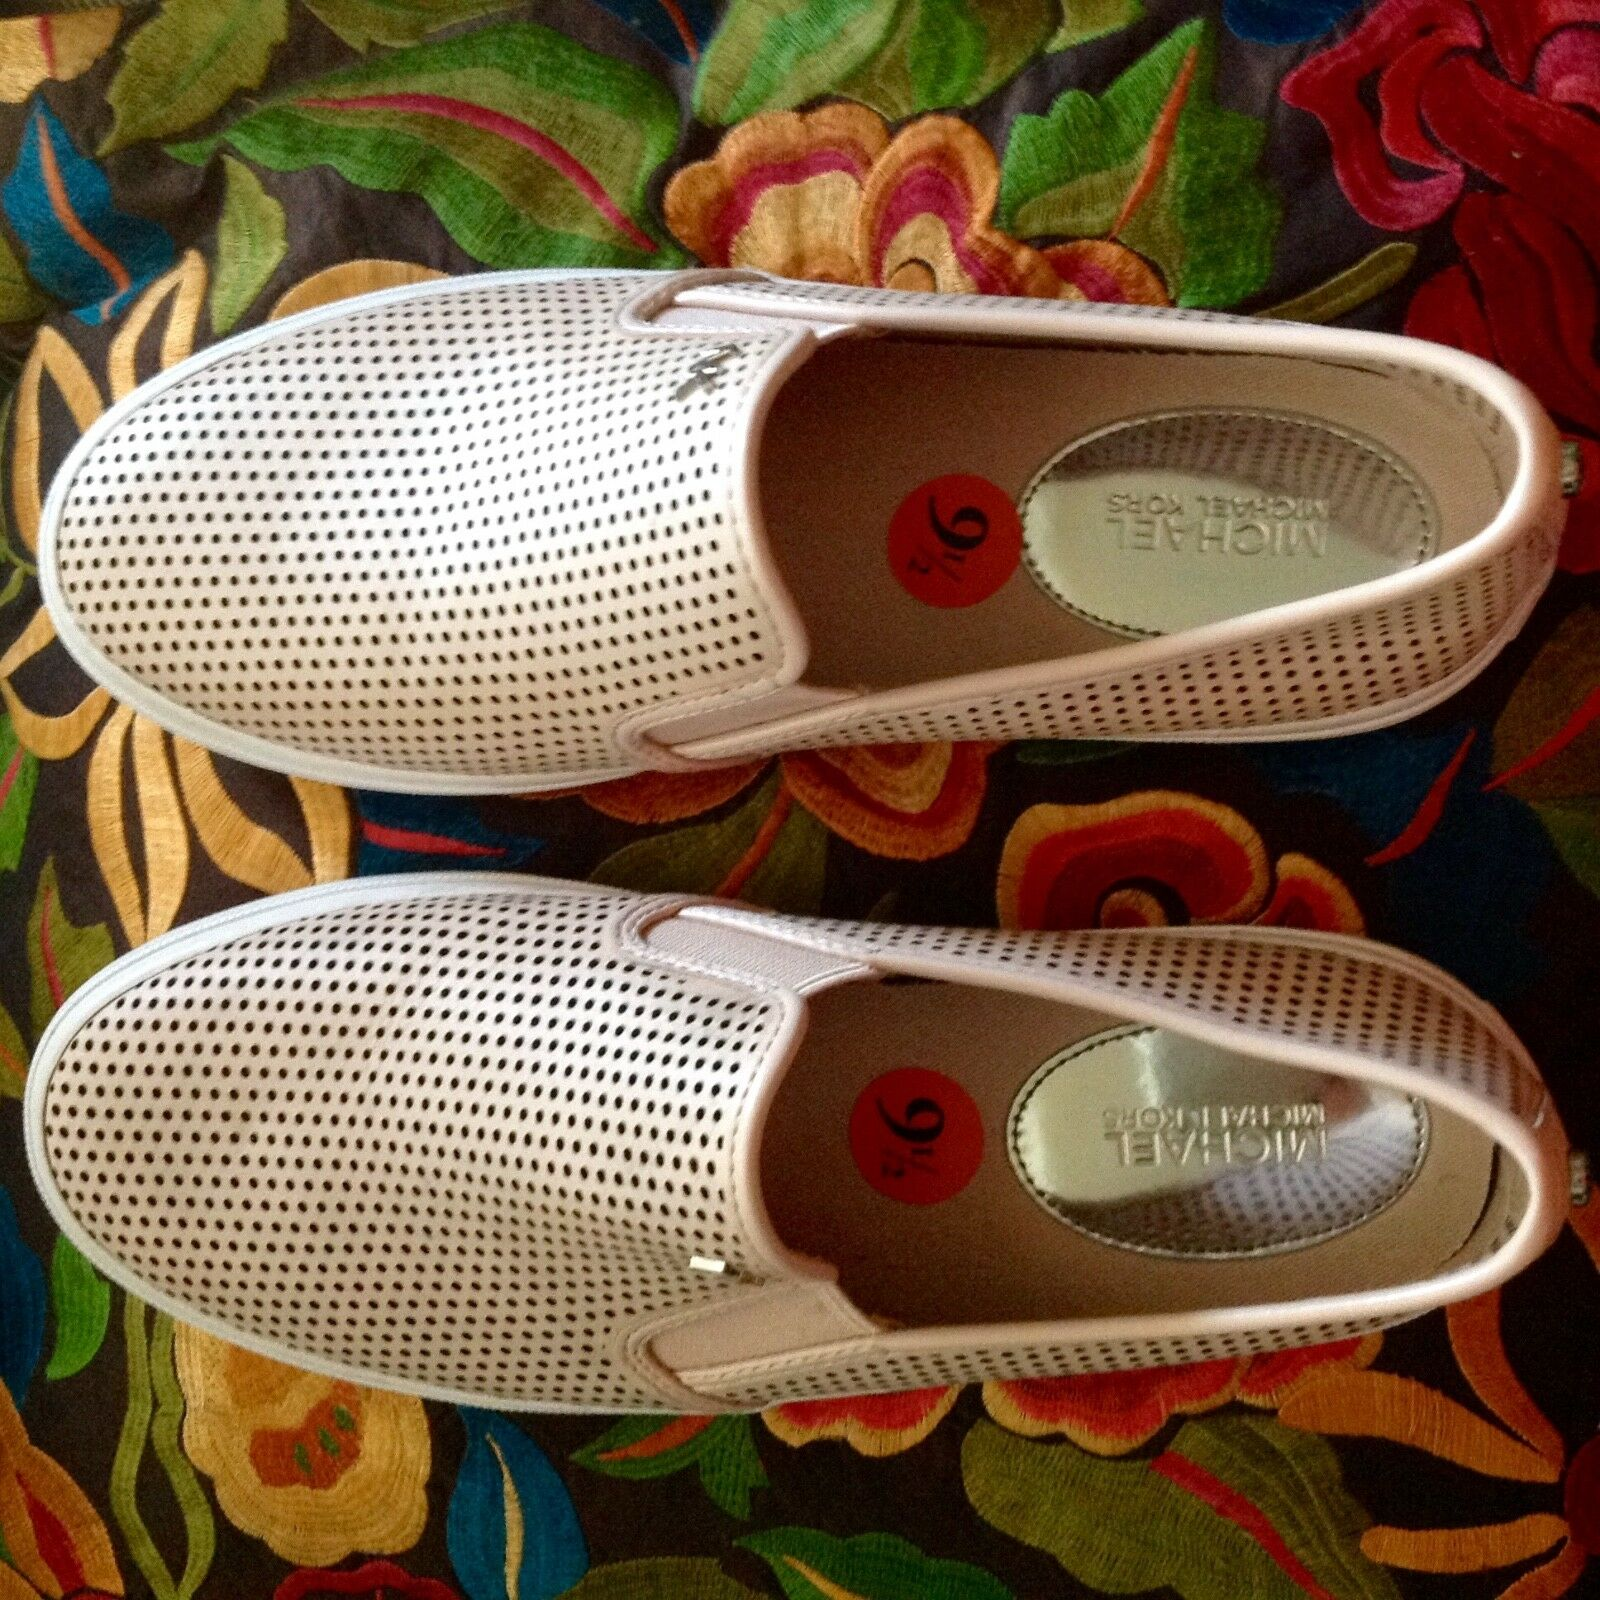 NEW MICHAEL MICHAEL KORS WOMEN'S BOERUM DOUBLE GORE SLIP ON SNEAKERS size 9.5NIB